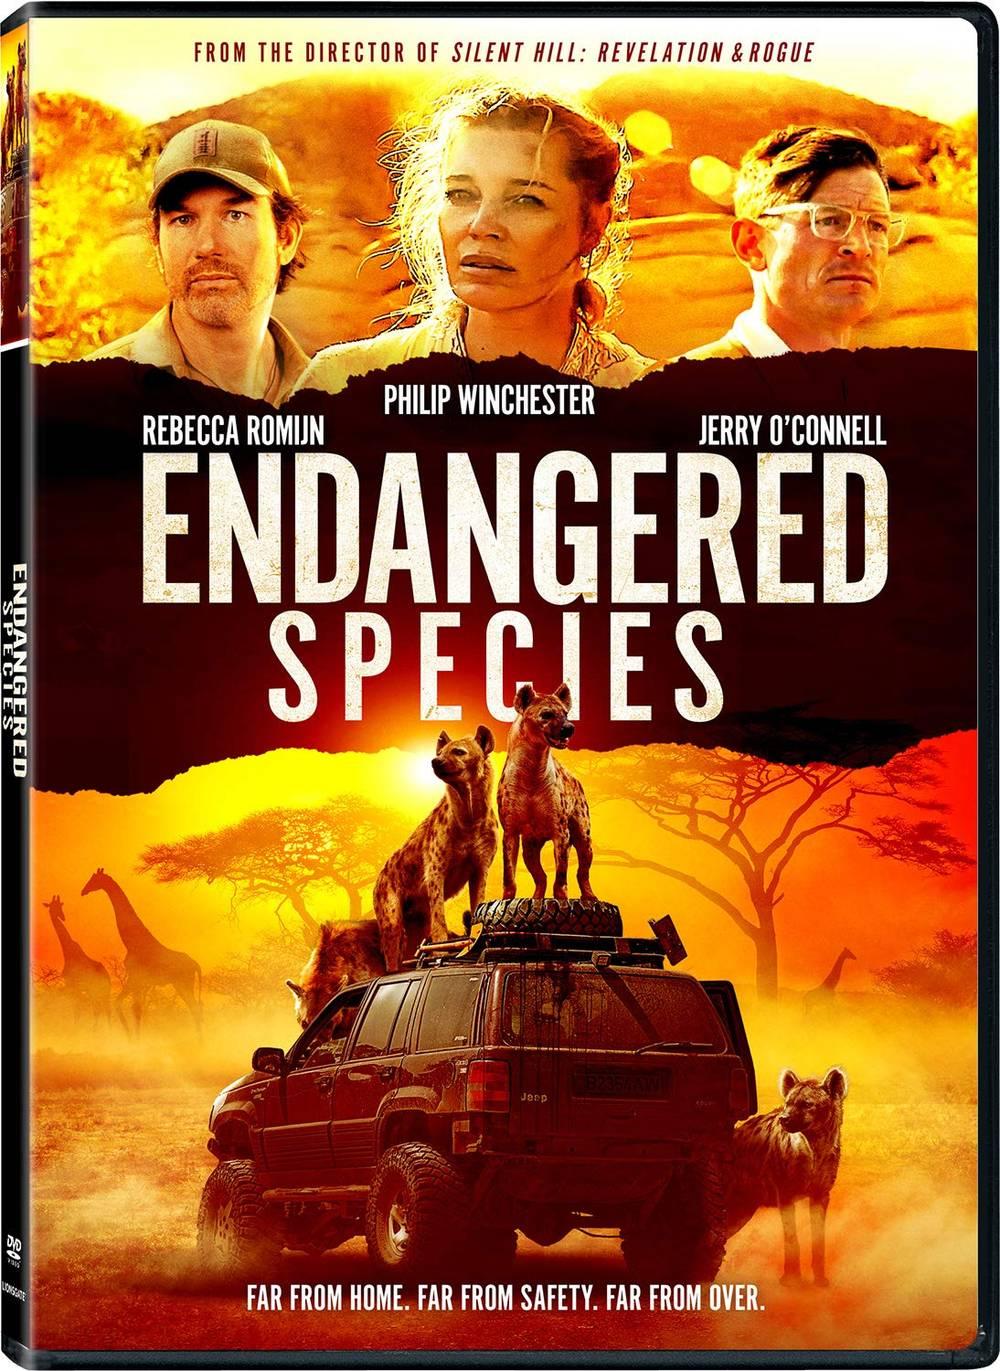 Endangered Species [Movie] - Endangered Species